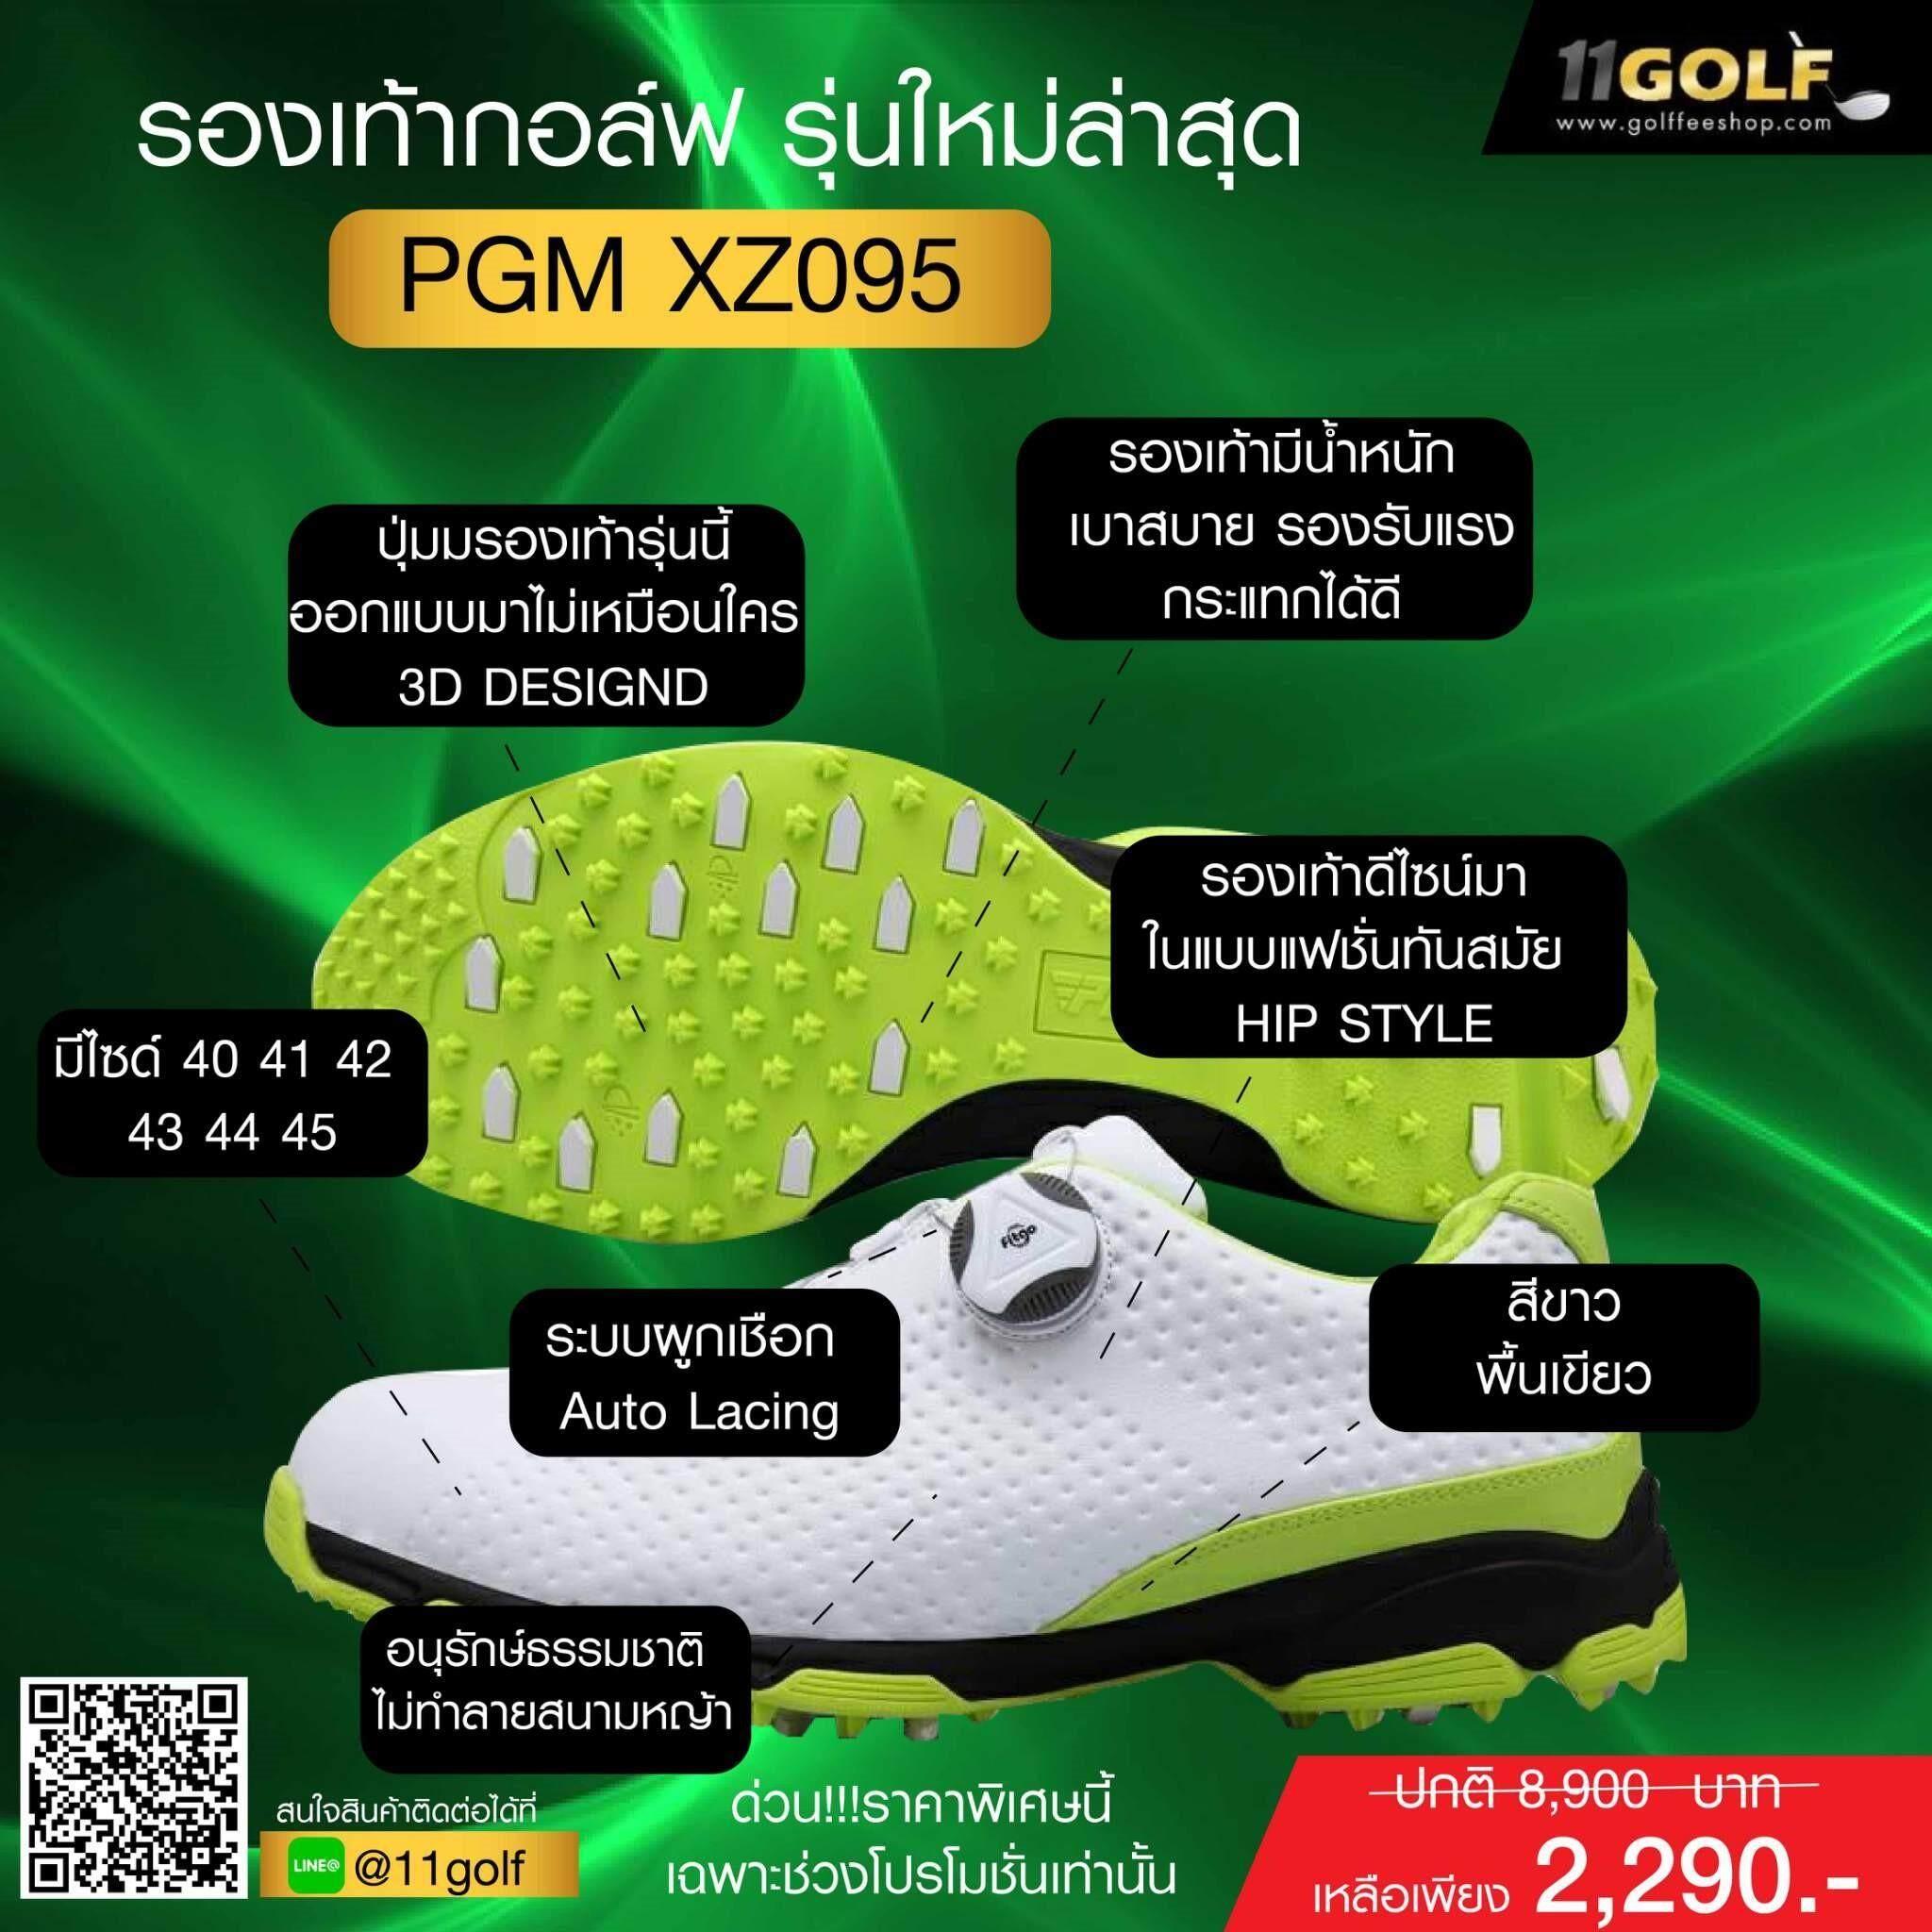 11golf ขอเปิดตัว รองเท้ากอล์ฟ รุ่นใหม่ล่าสุด รองเท้ากอล์ฟ Pgm Xz095 ระบบผูกเชือก Auto Lacing Systemที่กำลังเป็นที่นิยมอย่างสูงสุดในขณะนี้ รองเท้าดีไซน์มาในแบบแฟชั่นทันสมัย Hip Style ปุ่มรองเท้ารุ่นนี้ออกแบบมาไม่เหมือนใคร 3d Designdเกาะพื้นสนามเป็นอย่างมาก By 11golf.